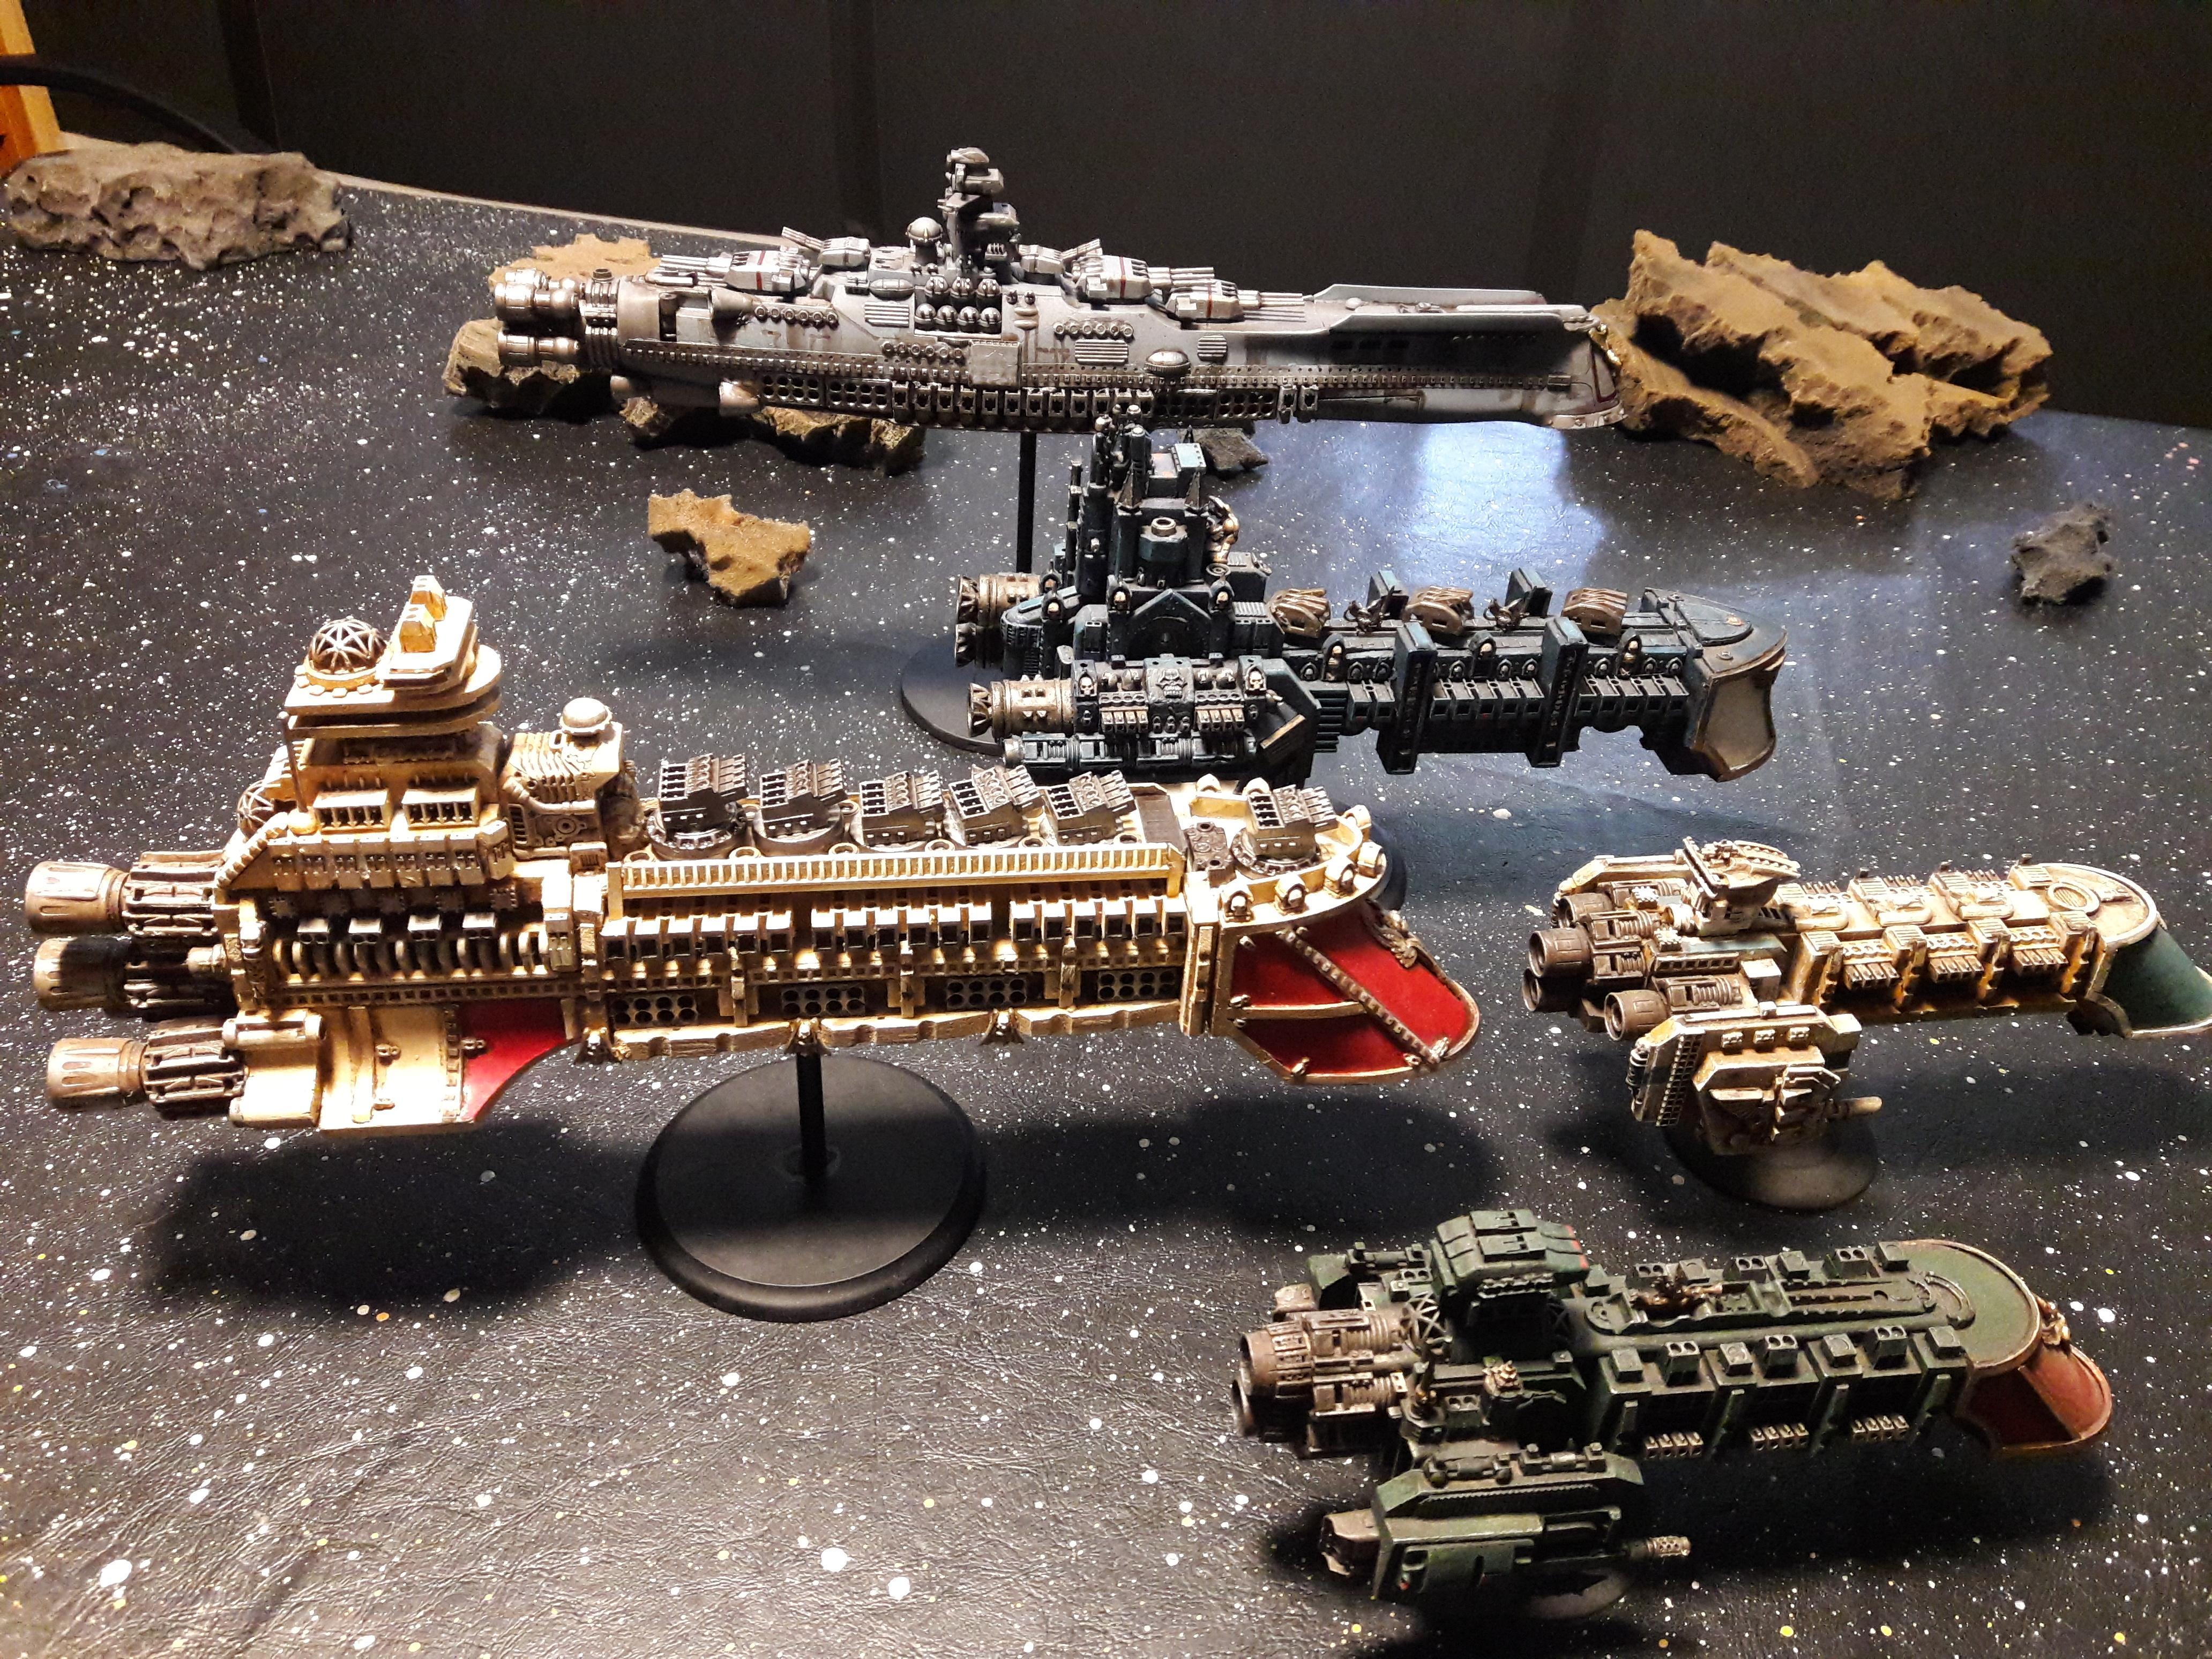 Battlefleet, Battleship, Cruiser, Gothic, Minis, Rogue Trader, Rpg, Terrain